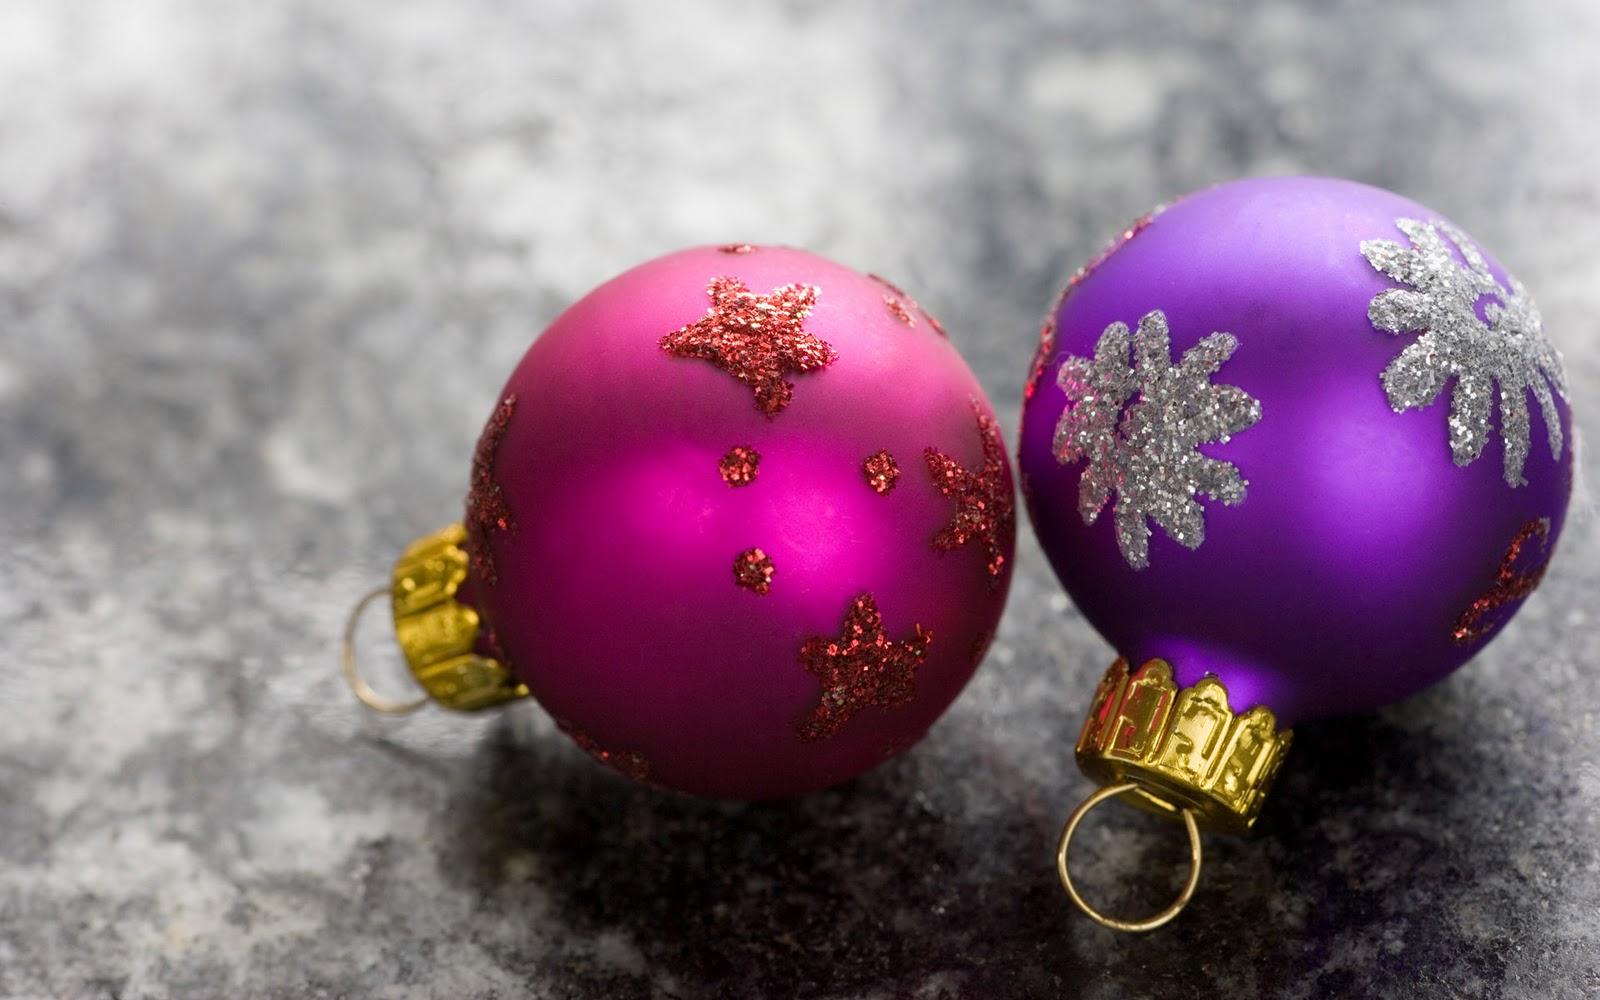 pretty christmas screensavers 21655 1600x1000 px hdwallsource com